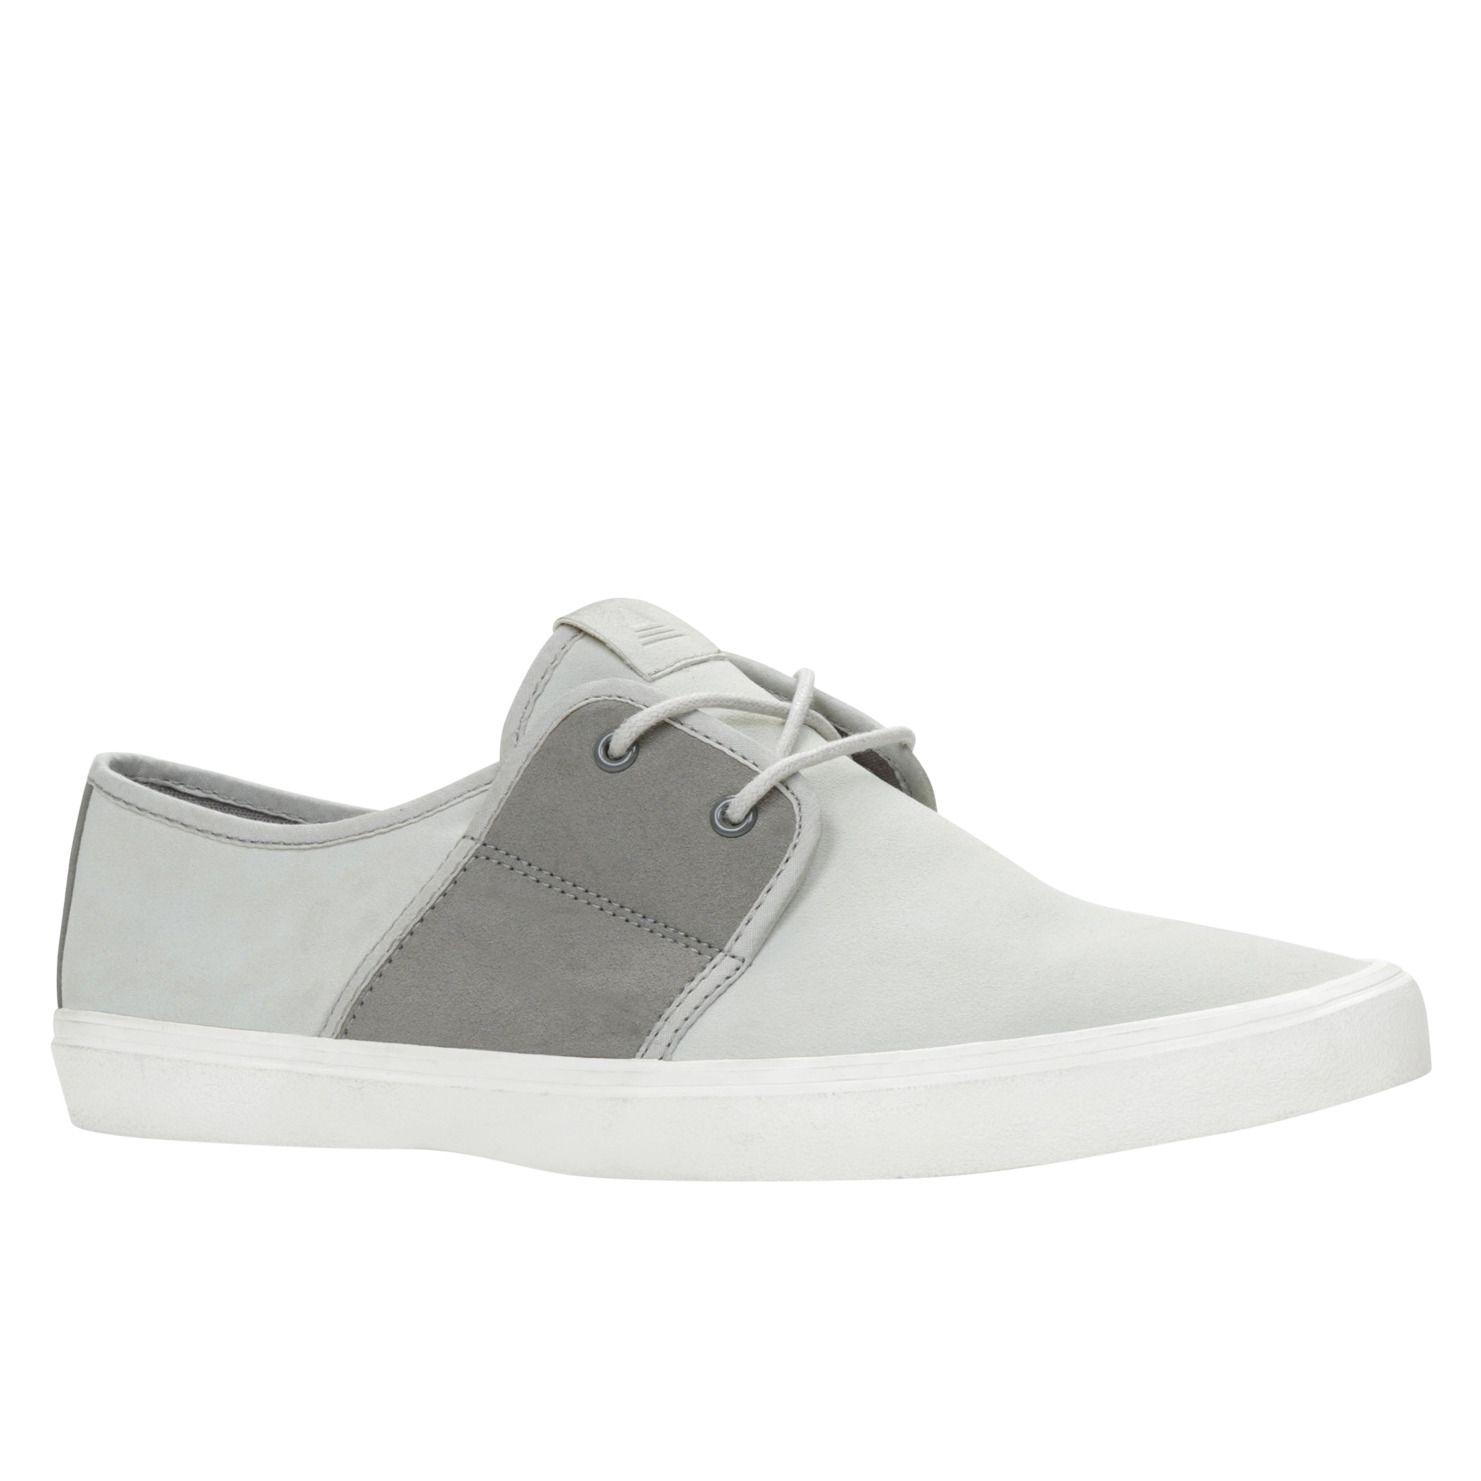 ALDO Shoes. | Sneakers men, Shoes, Sneakers